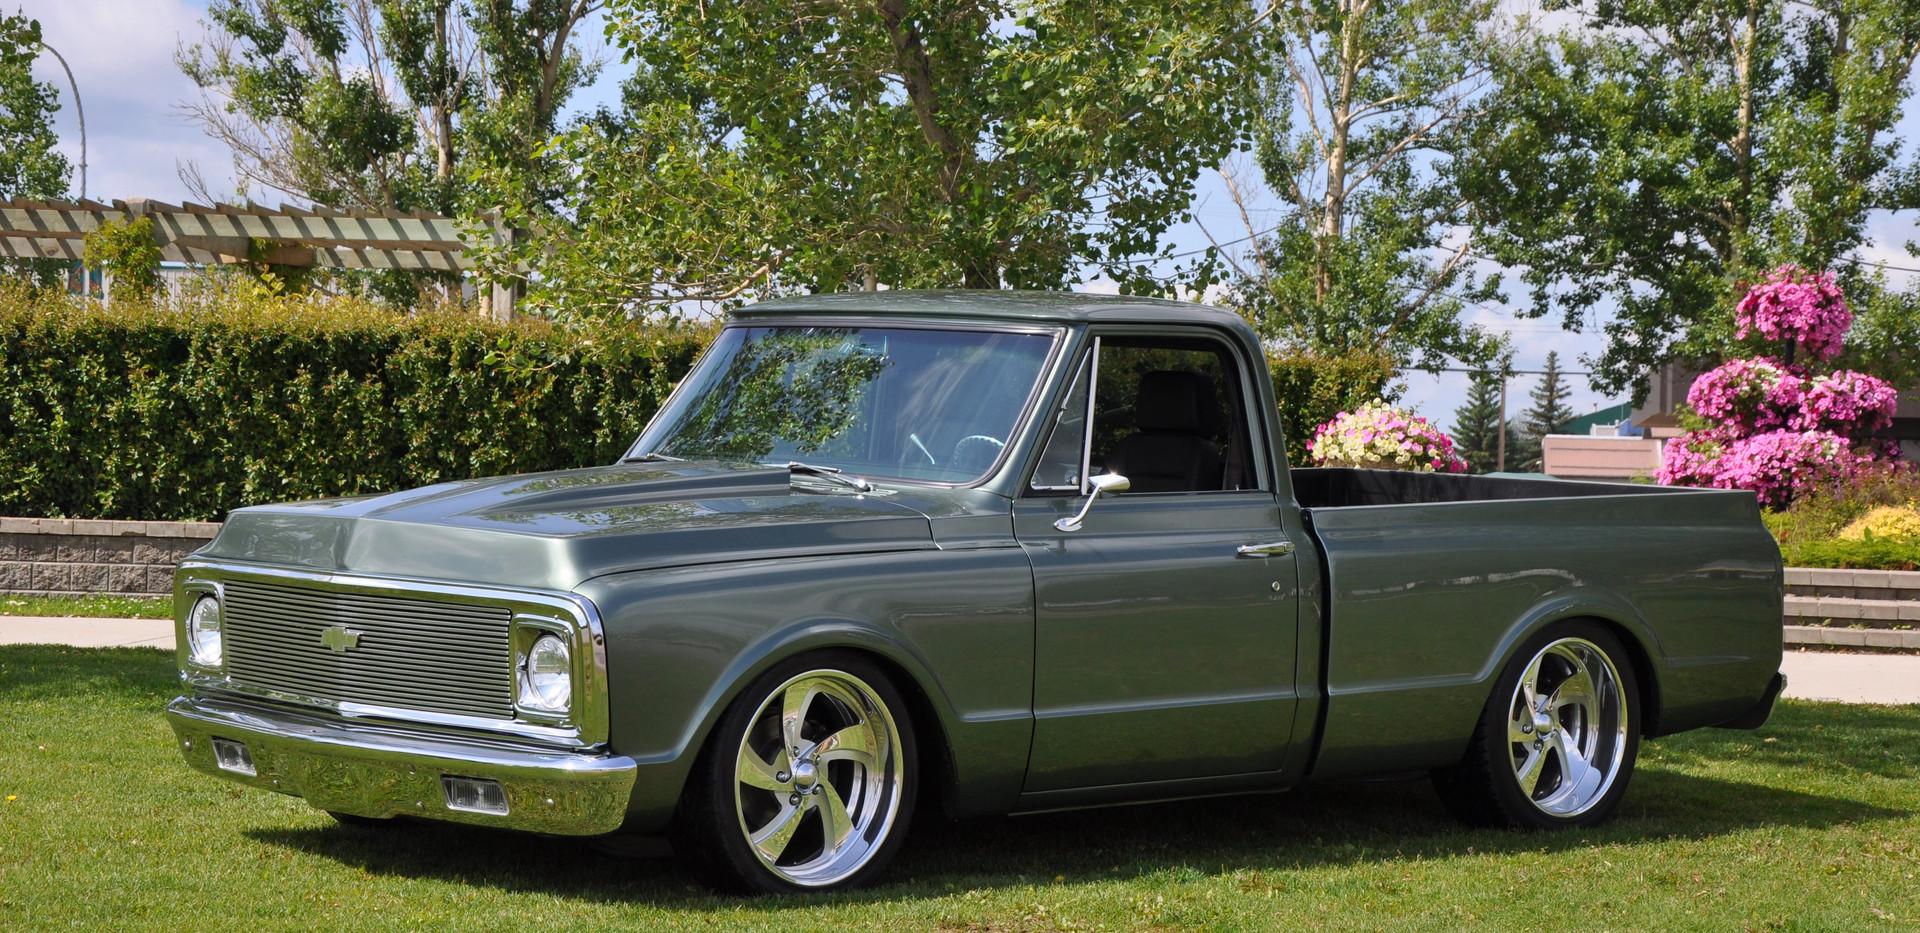 1971 Chev Pickup